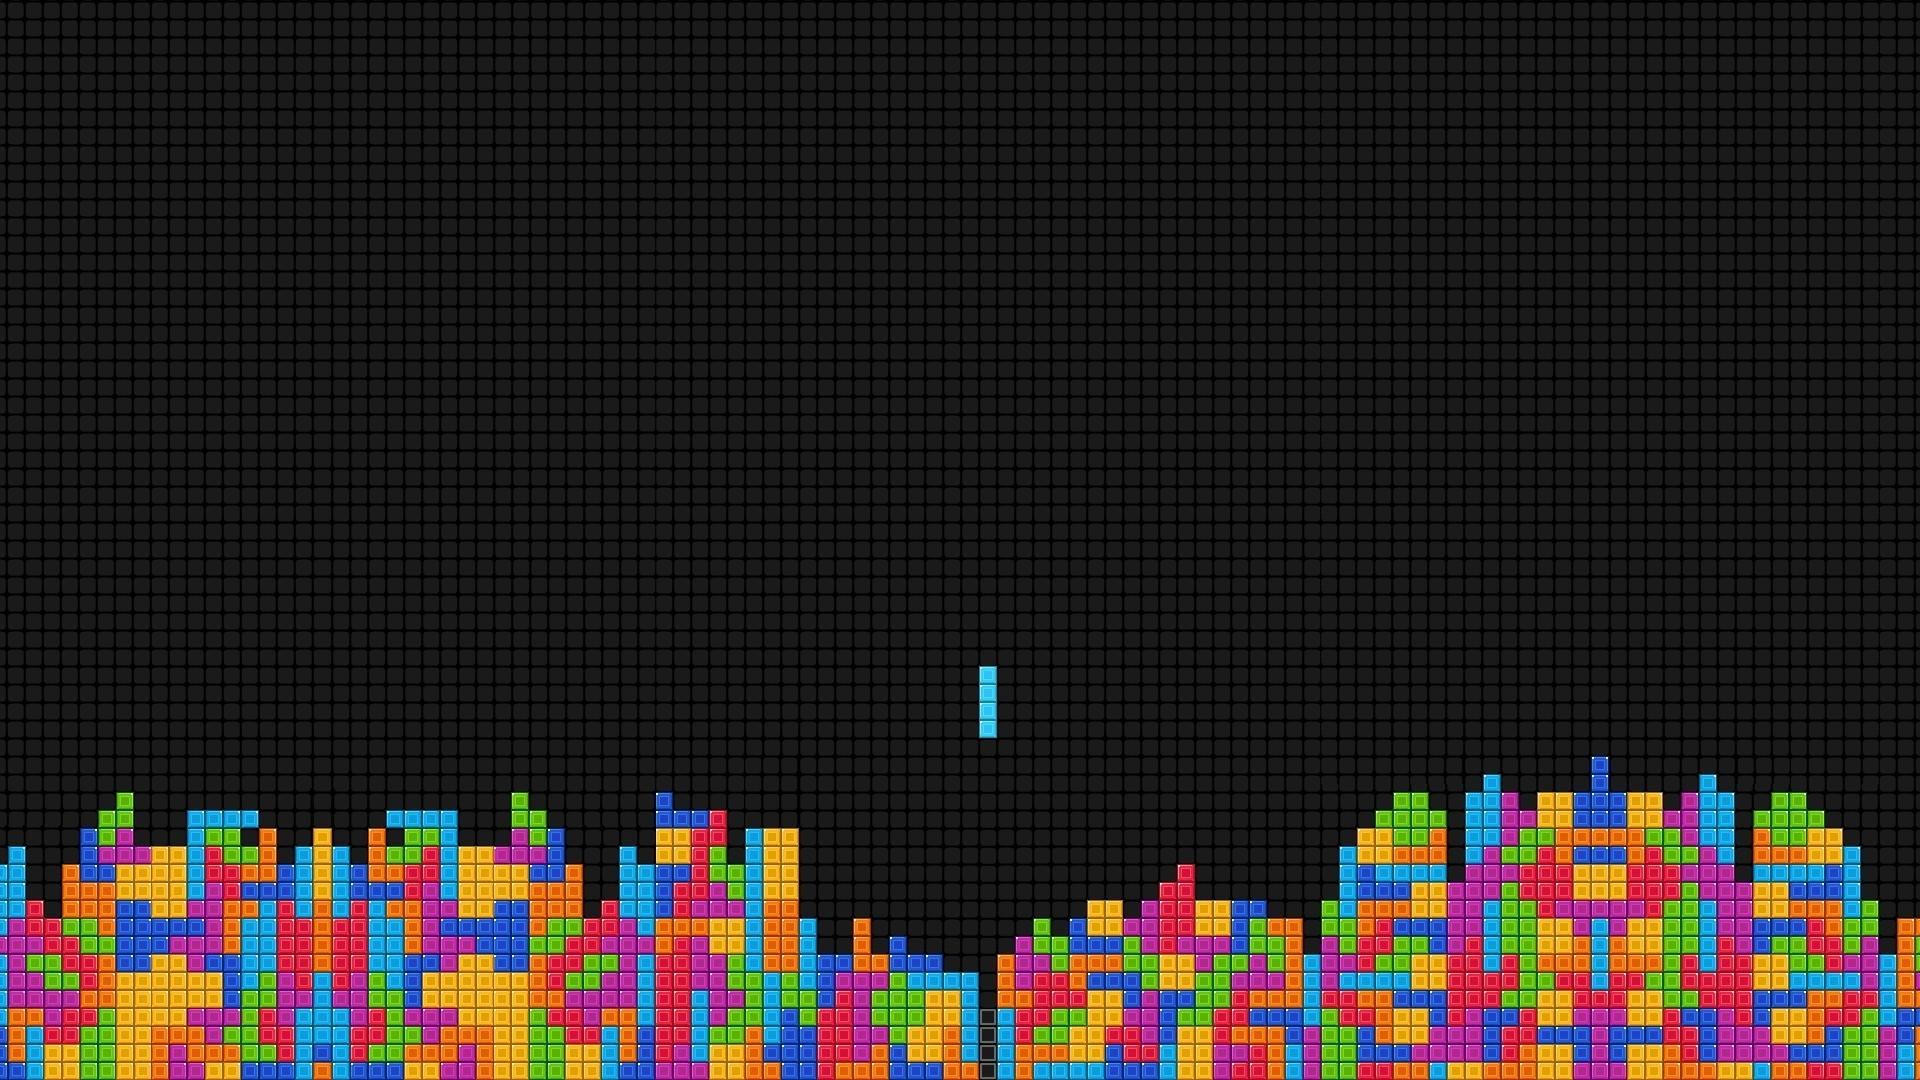 Gaming Desktop Wallpapers HD (38 Wallpapers)